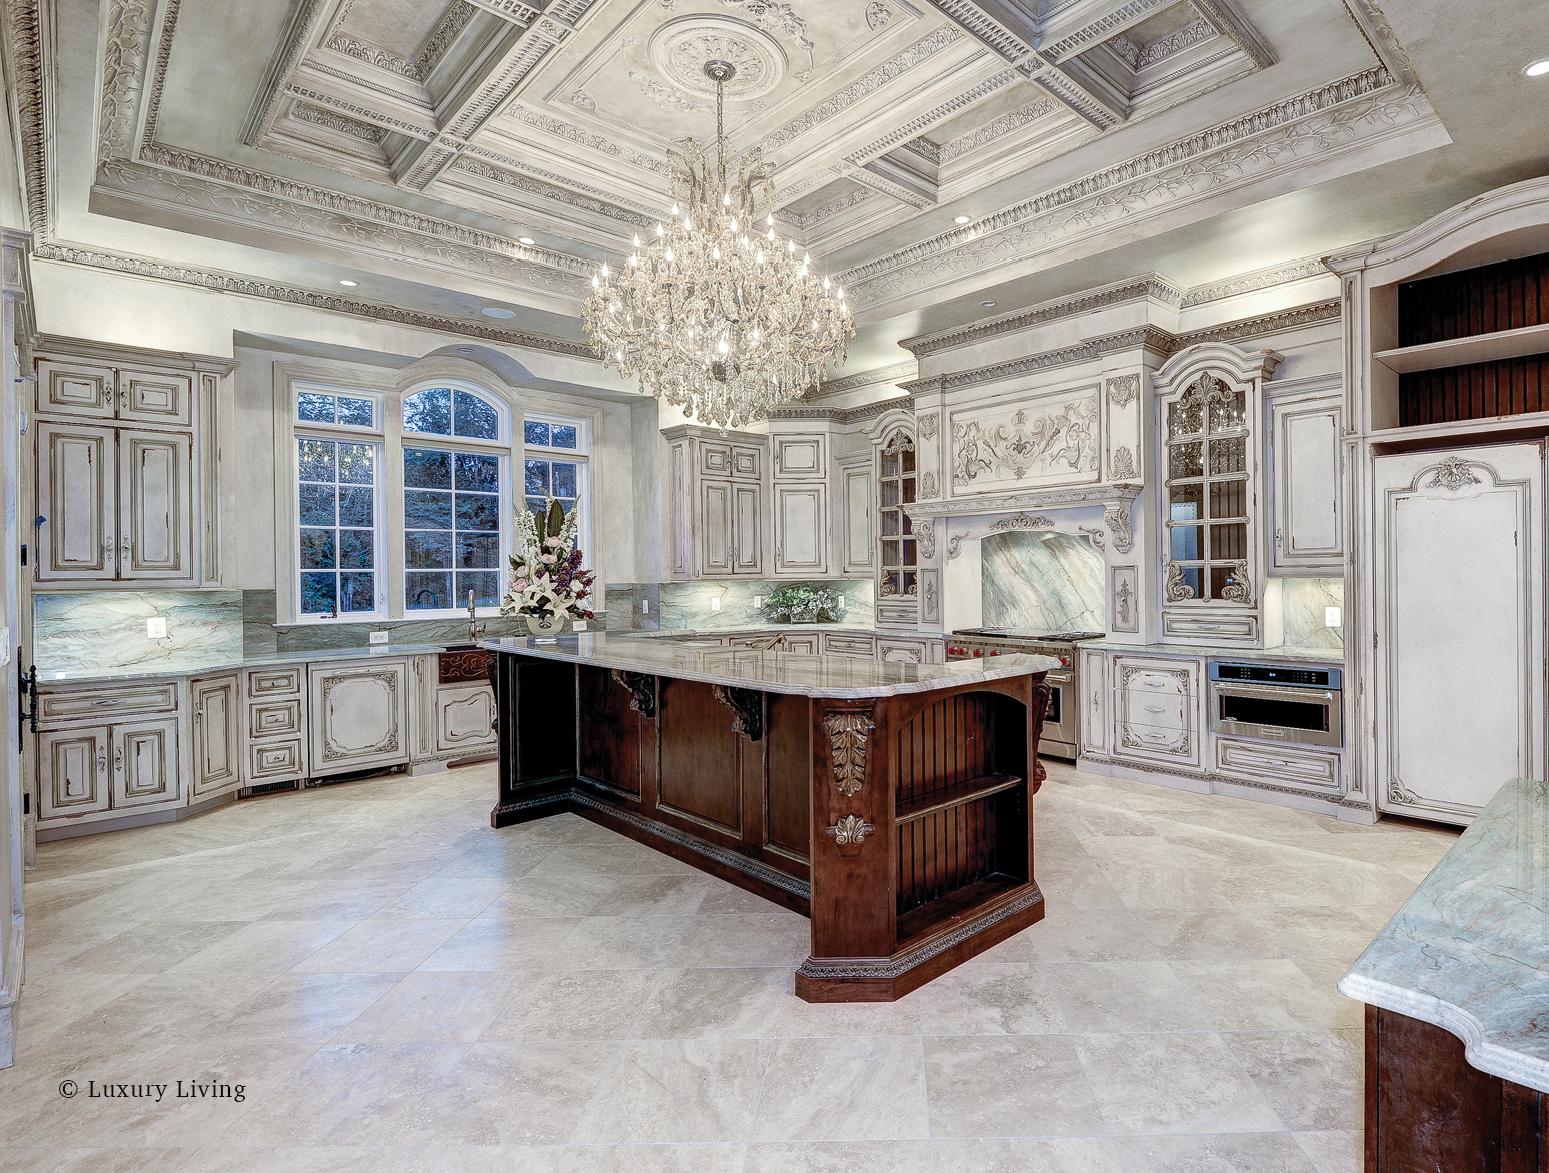 Grand Kitchen With Custom Art On Hood